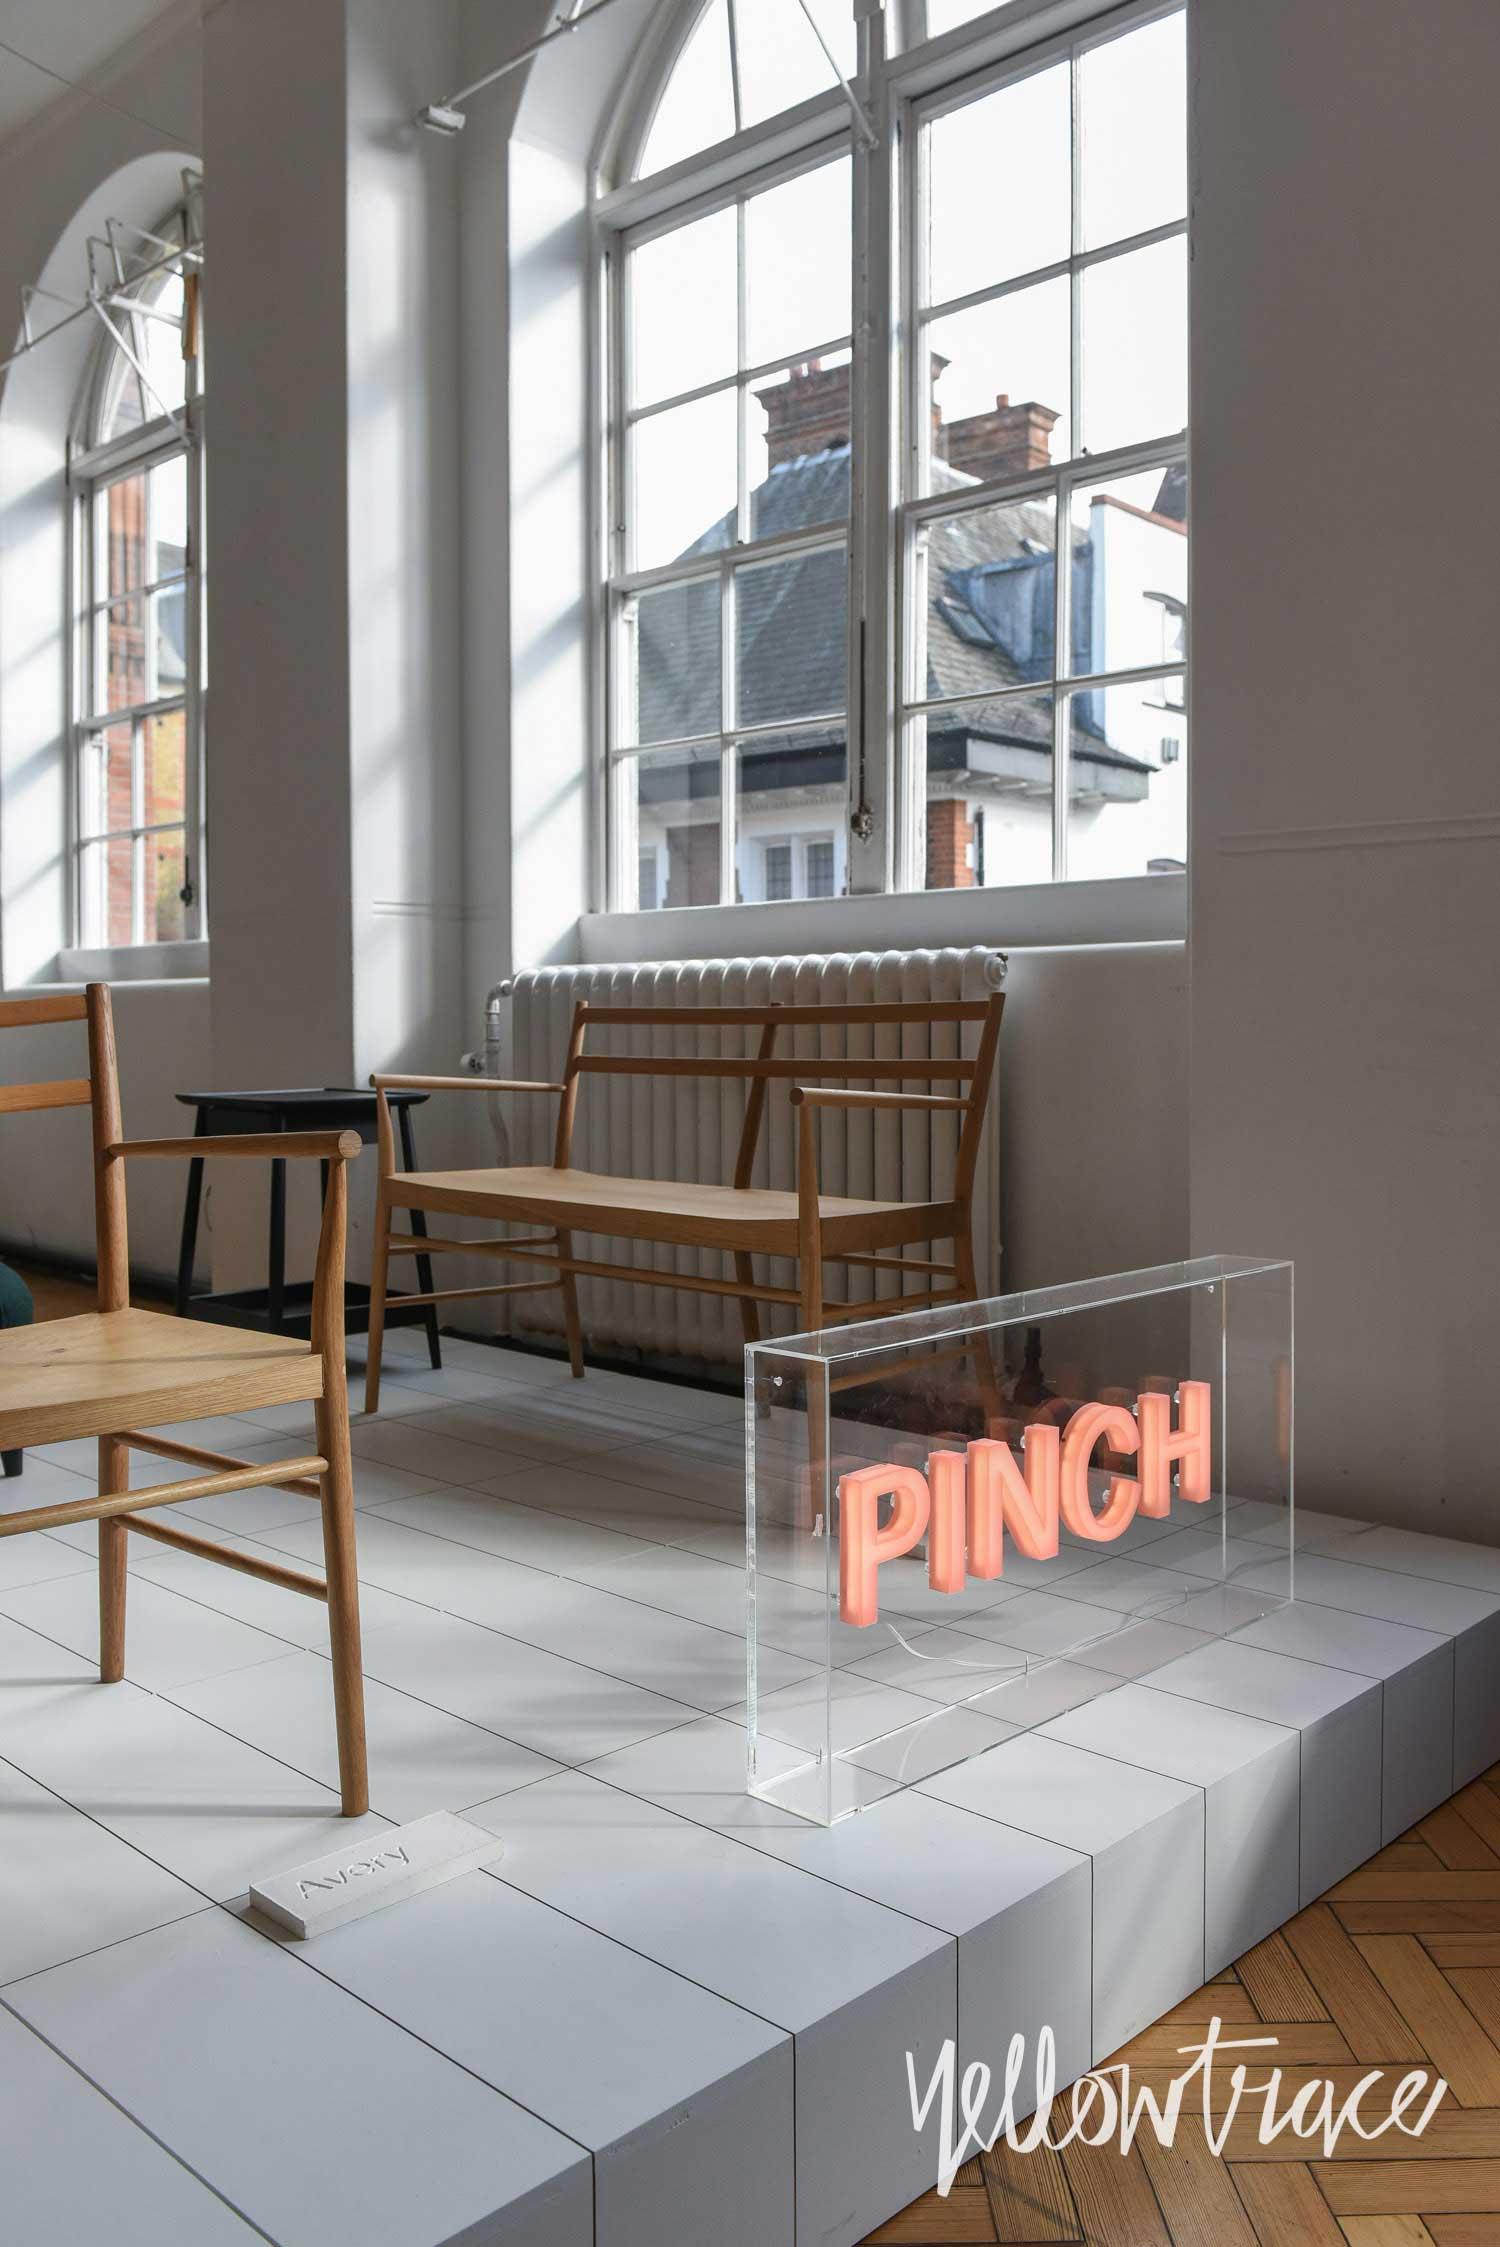 Pinch LDF15, Photo ©Nick Hughes | Yellowtrace